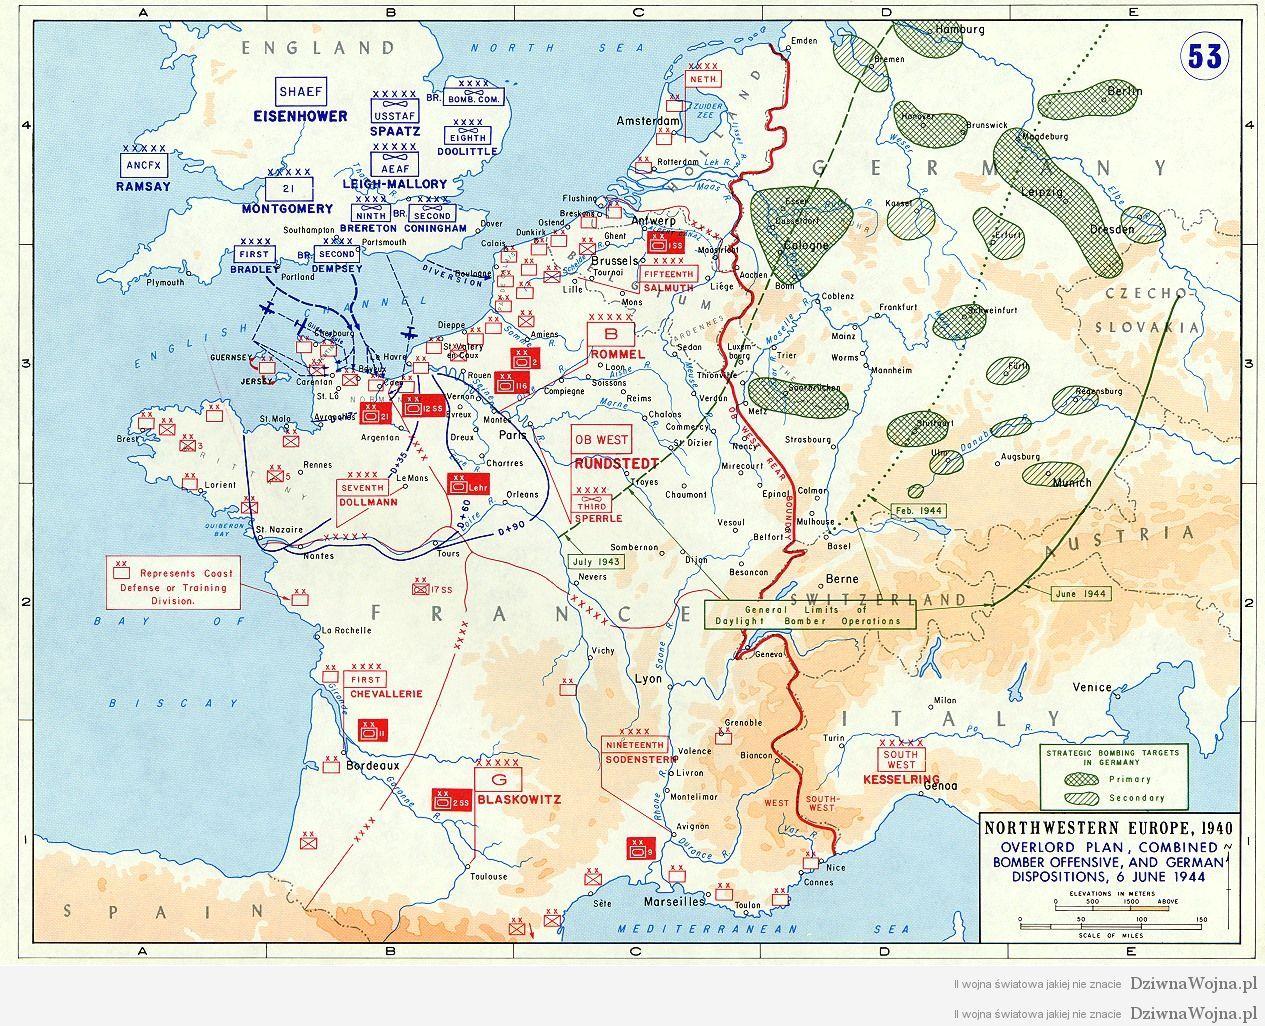 d-day mapa